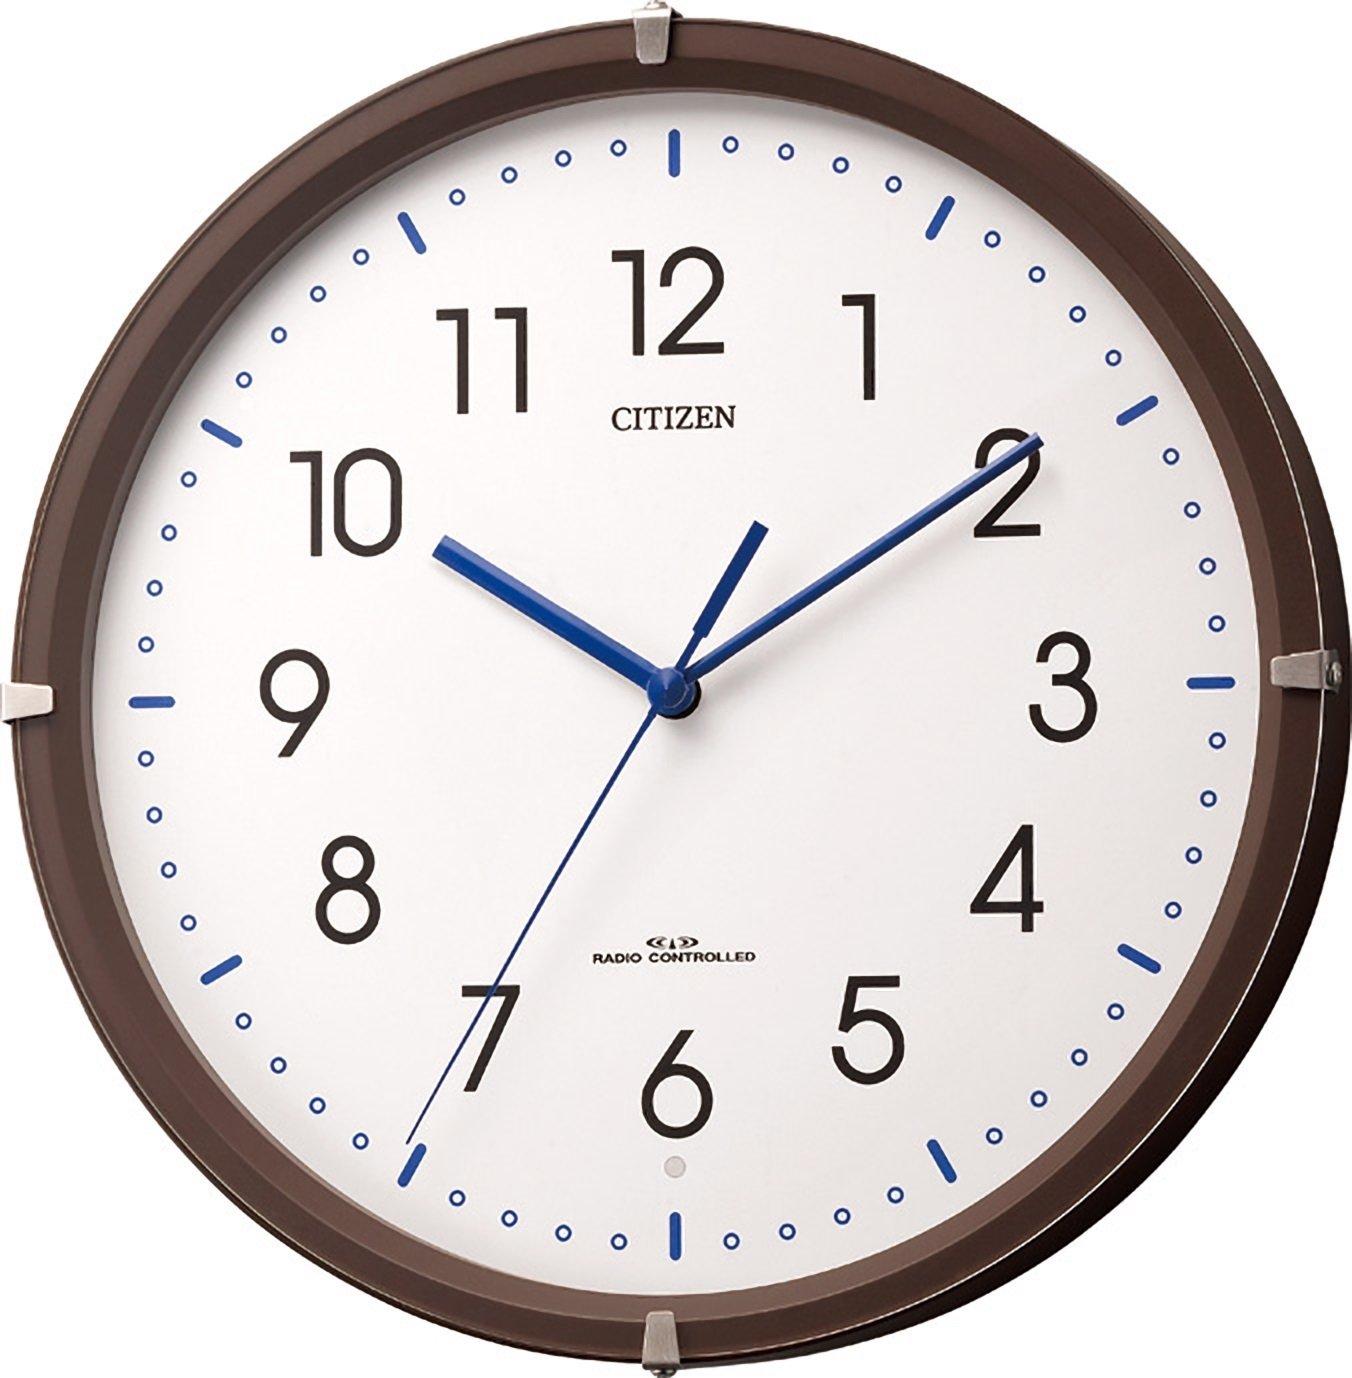 CITIZEN 電波夜眠る運針 シンプルモードミニ 茶色半艶仕上げ 4MYA23-006 B00GXT1F60